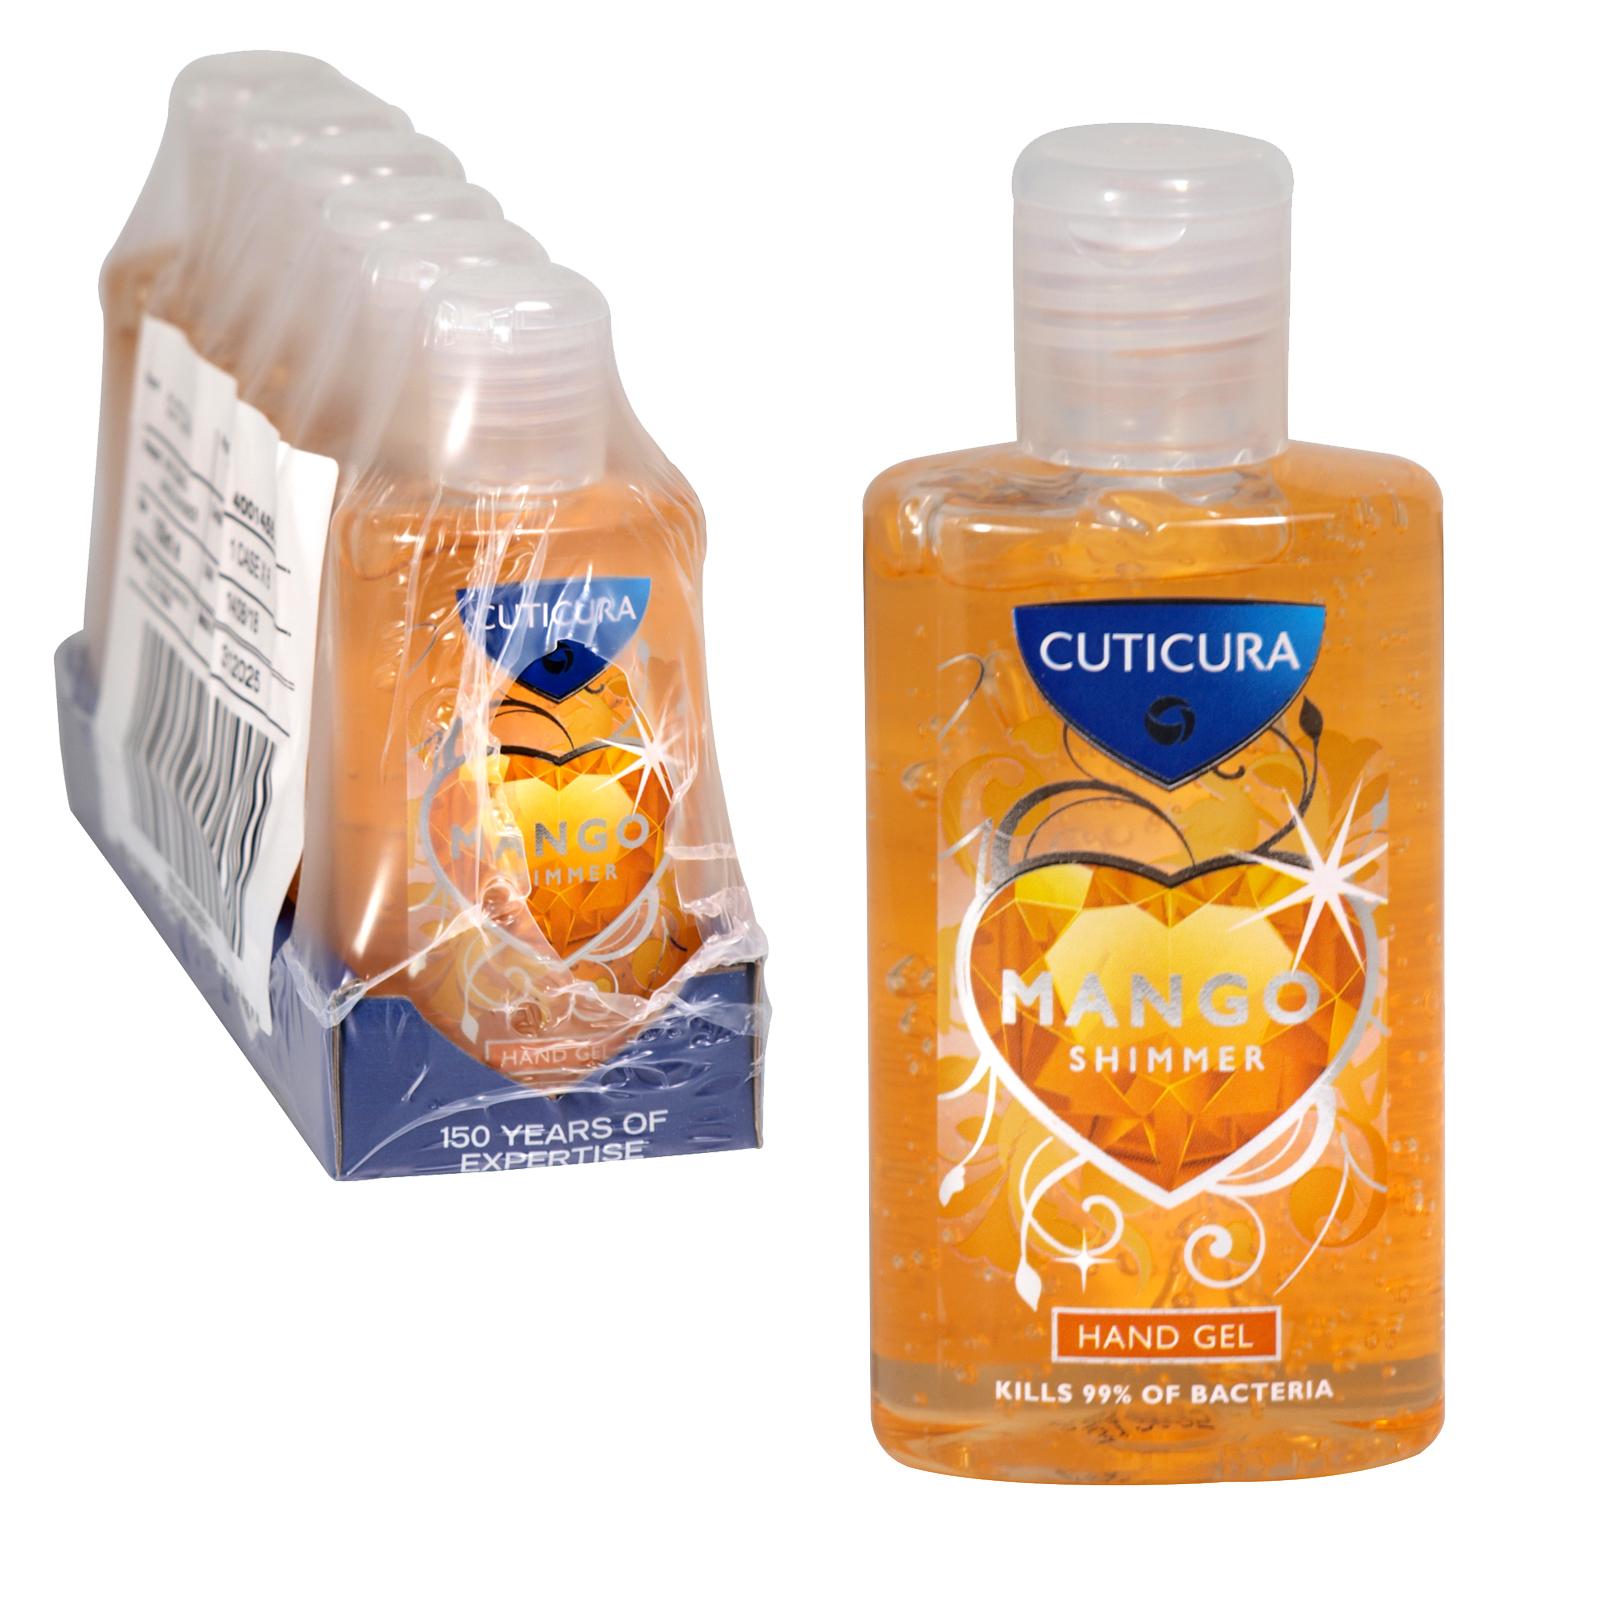 Health And Beauty Shower Bath Cheap Branded Uk Discount Store Cussons Baby Shampoo Coconut Oil Aloe Vera 100 Ml Cuticura Anti Bac Hand Gel 100ml Mango Shimmer X6